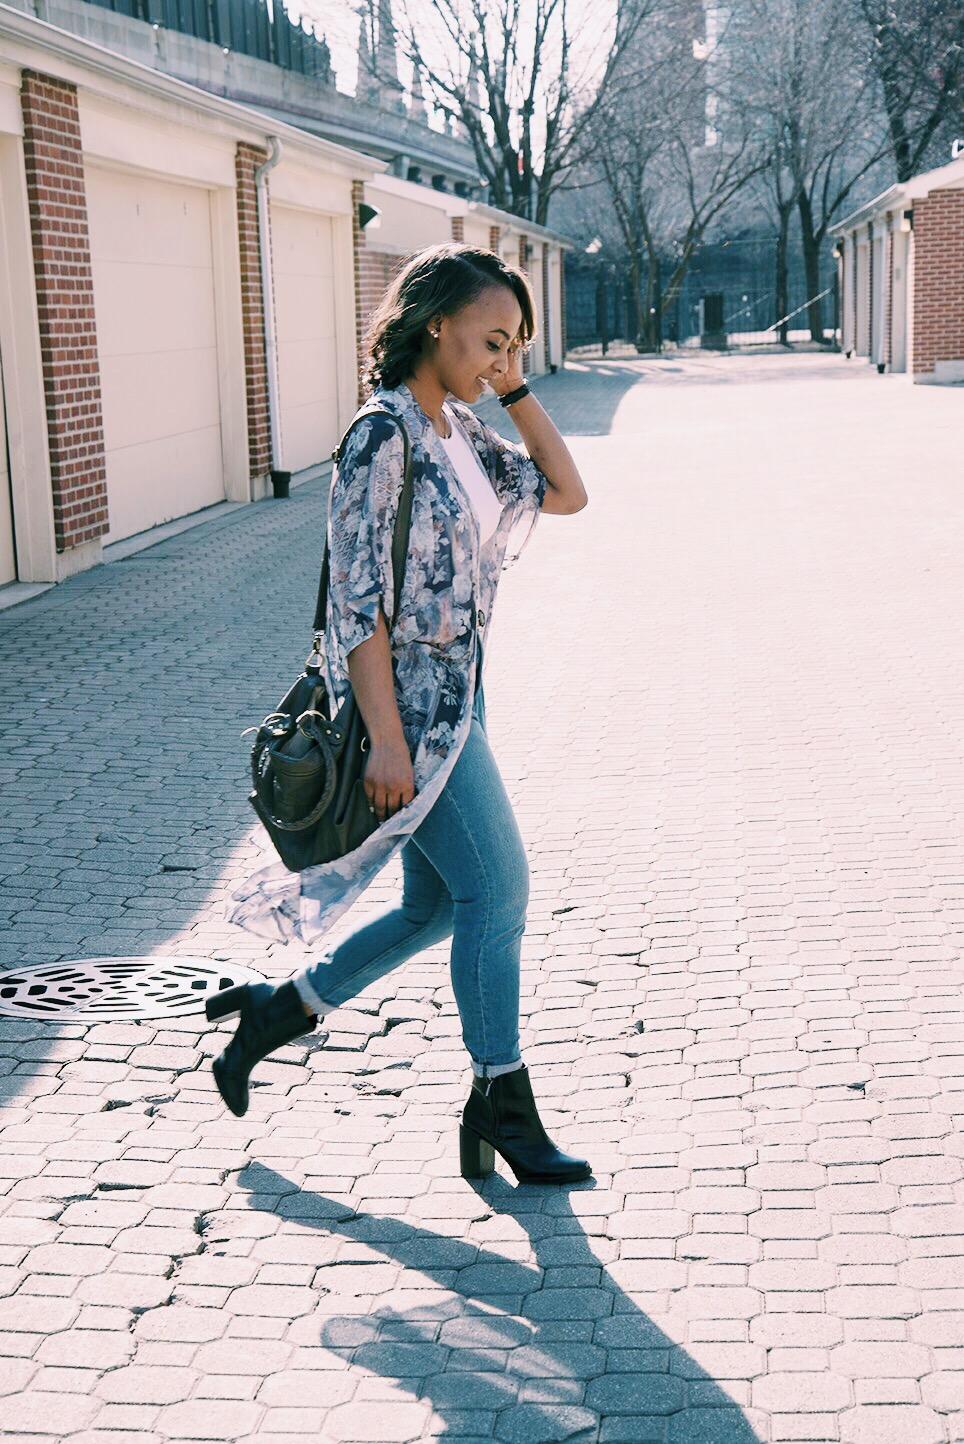 Kimono: Urban Outfitters / Top: H&M / Jeans: UO Surplus / Boots: Zara / Bag: Aldo / Watch: Shinola